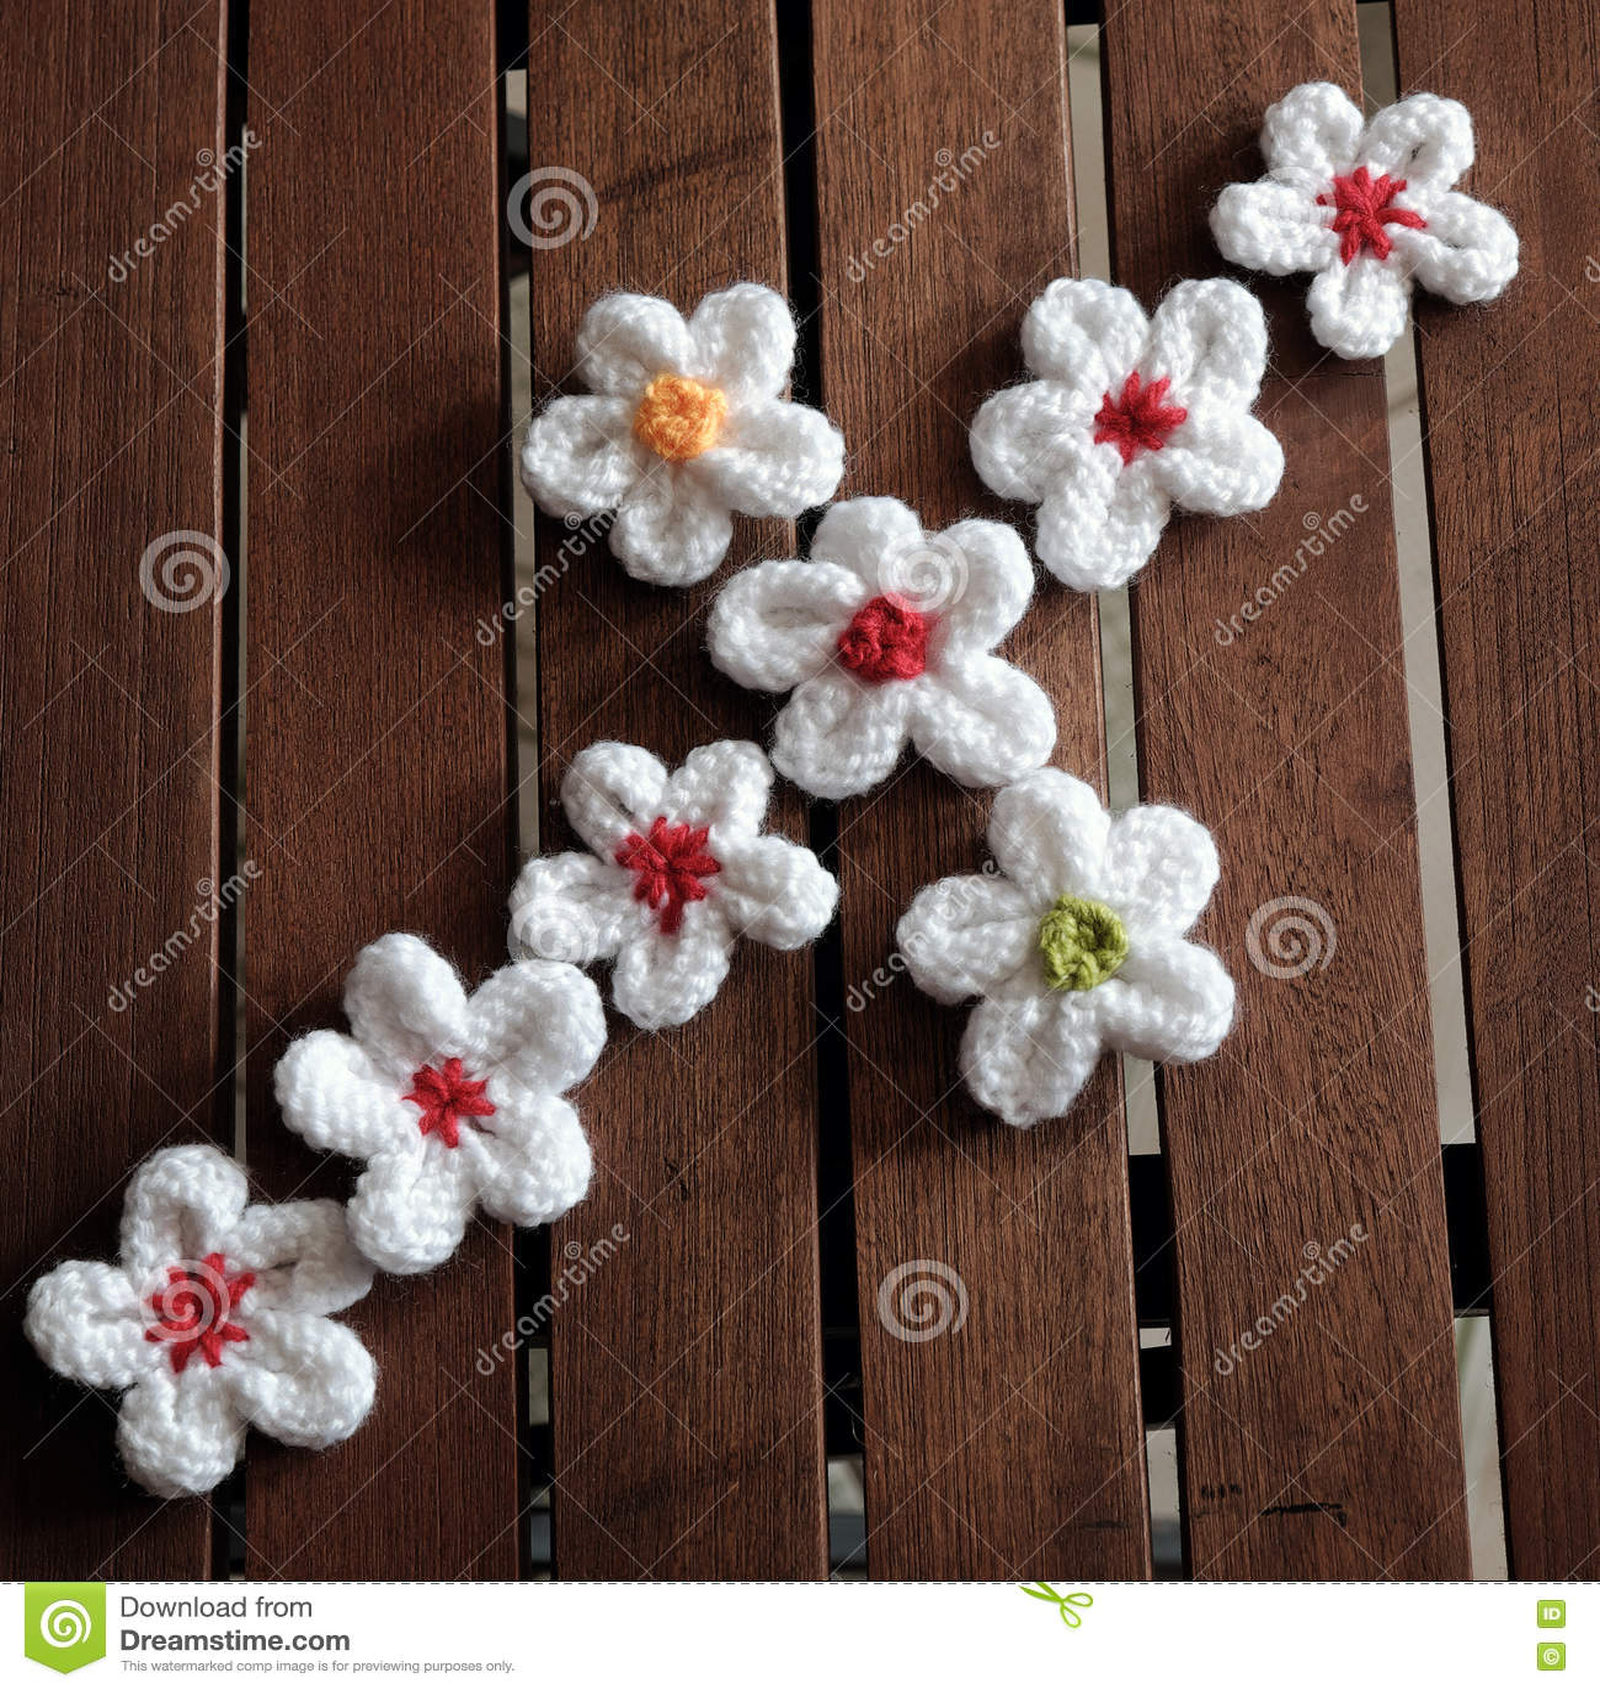 Knit Daisy Flower On Wood Background Stock Image Image Of